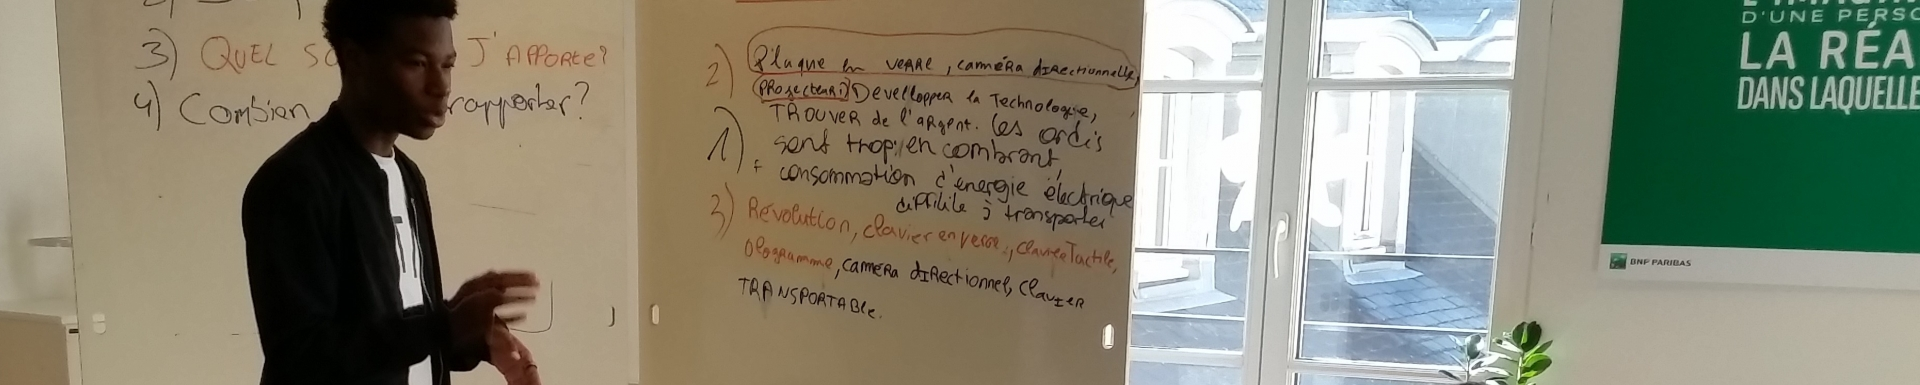 competences transversales